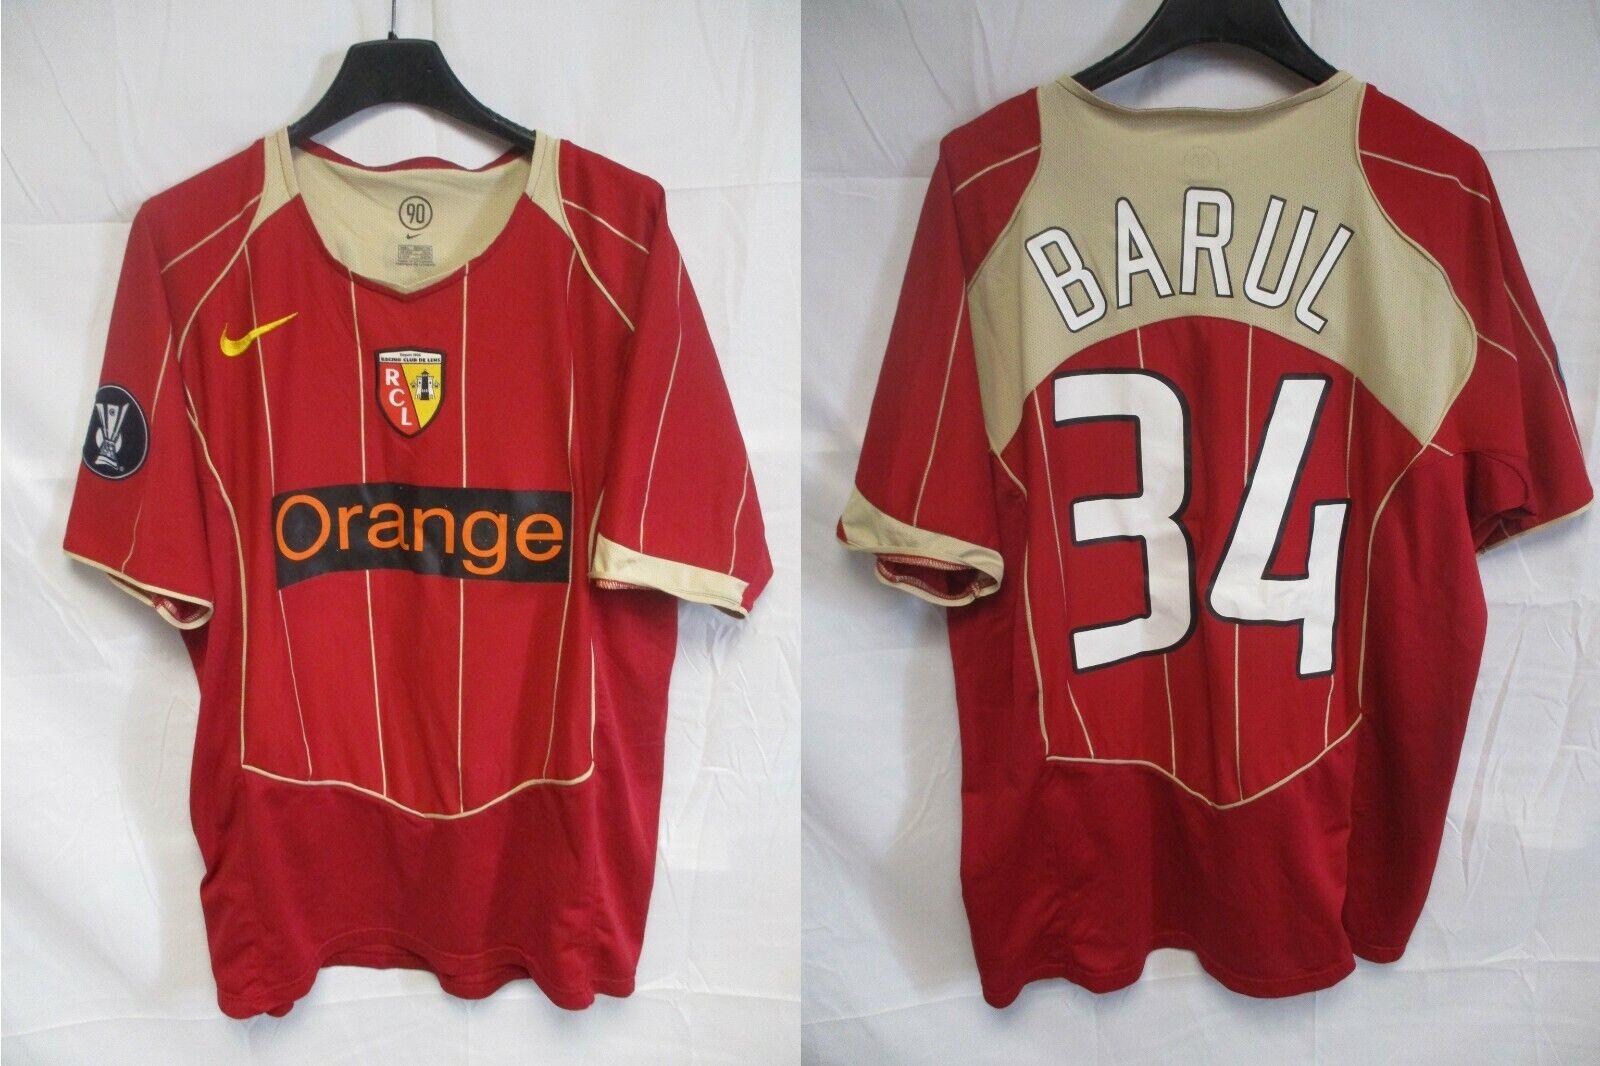 Maillot R.C LENS 2006 porté BARUL n°34 COUPE UEFA match worn shirt NIKE away L